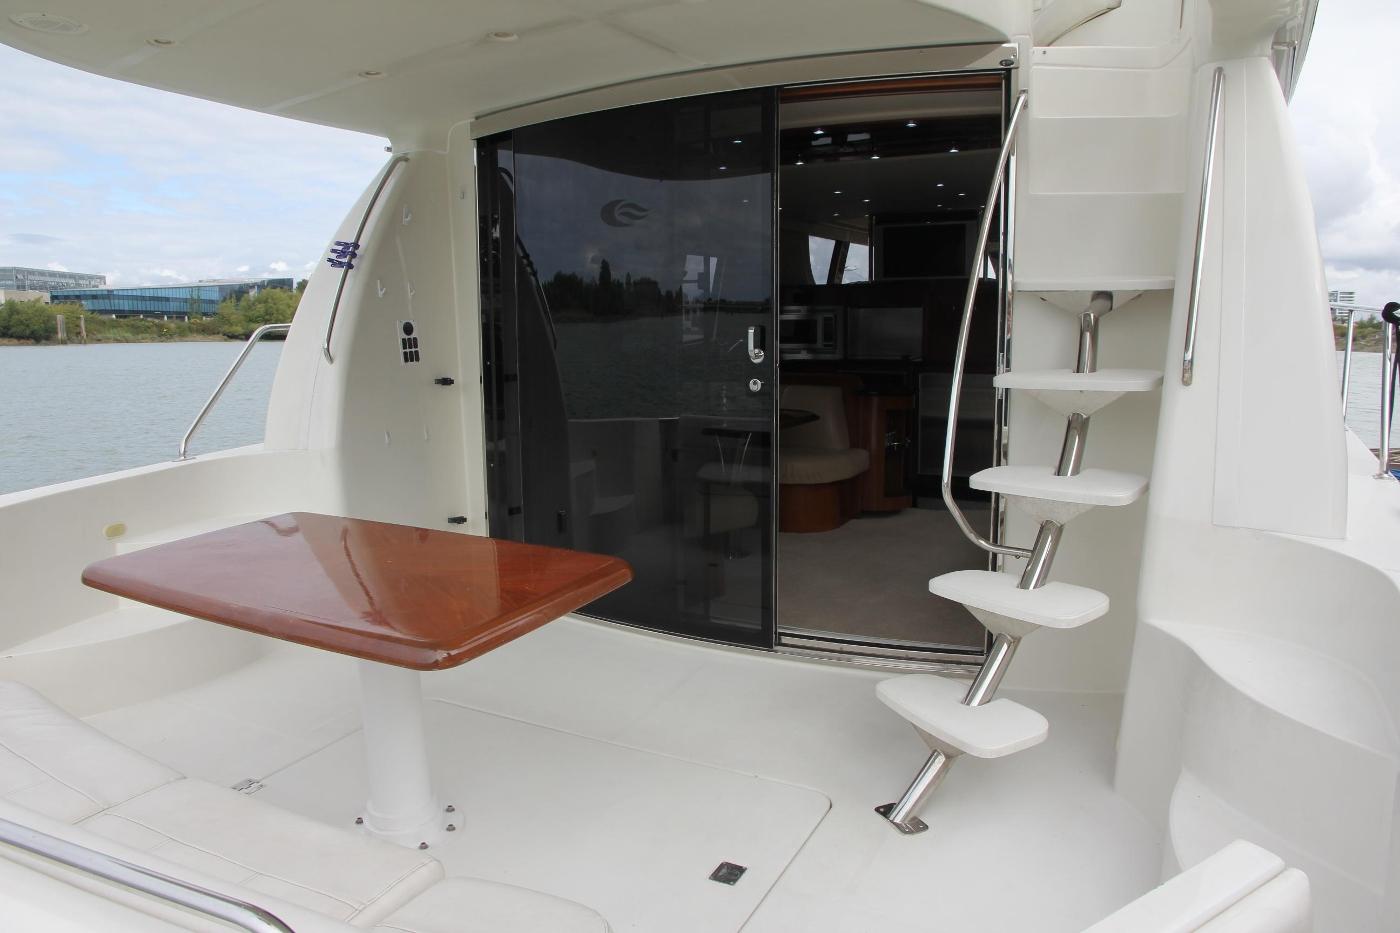 2005 Carver 560 Voyager Pilothouse, Aft Cockpit